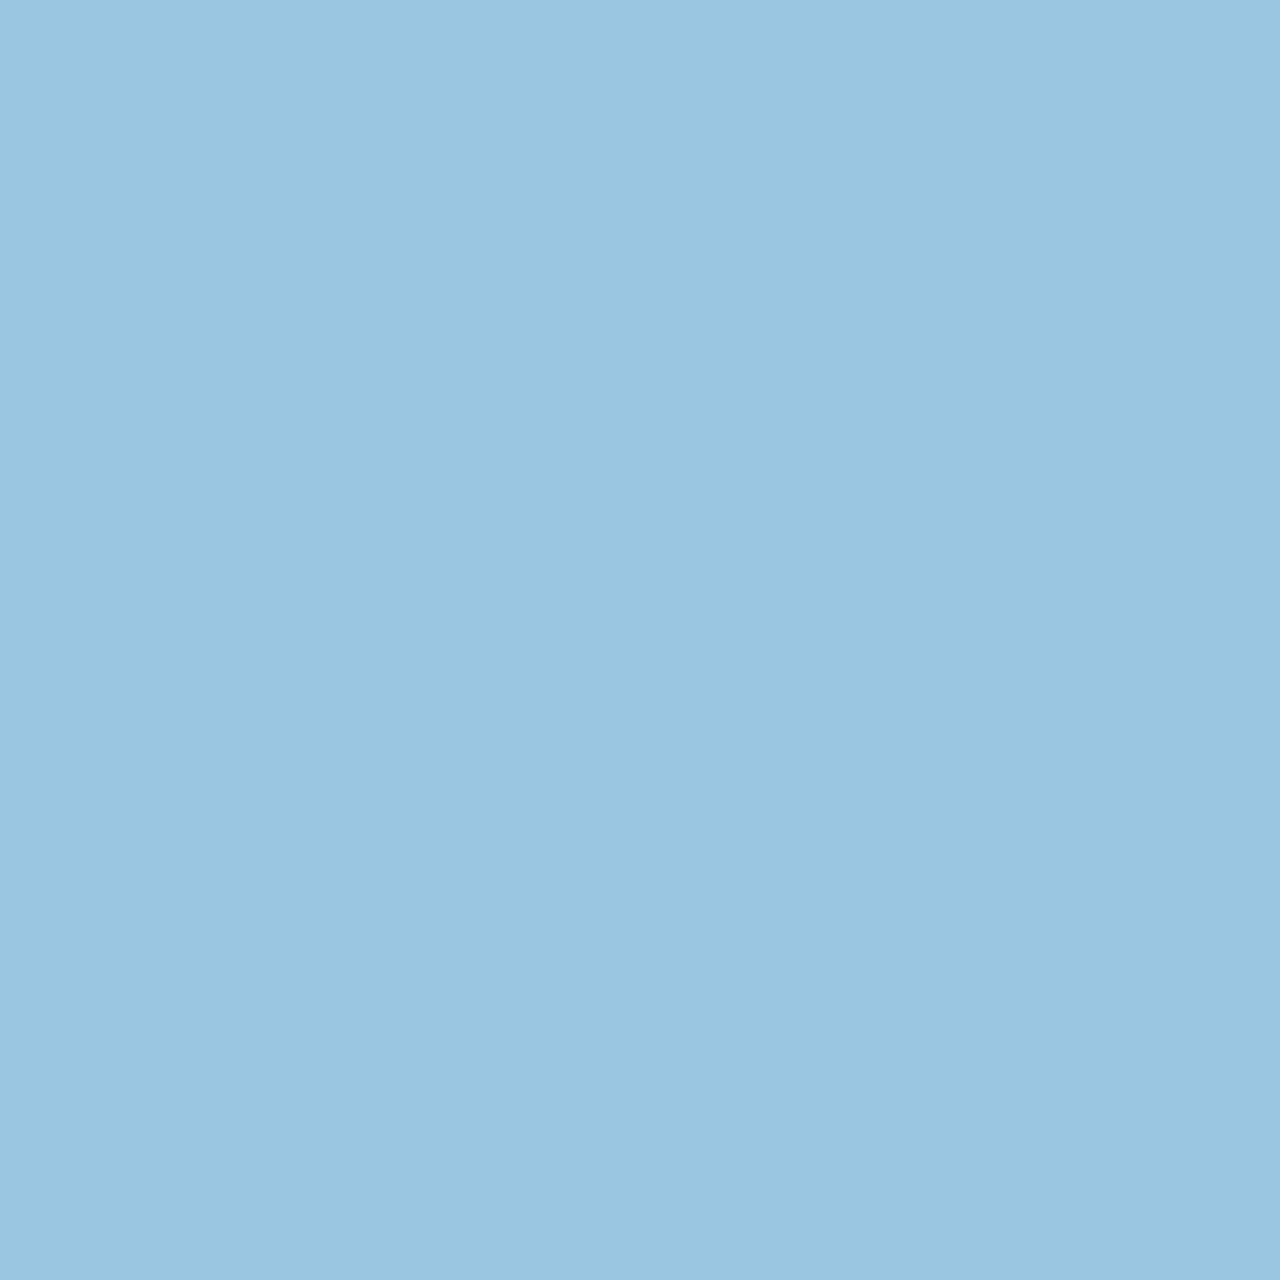 Rosco Cinegel Sheet #3208: Quarter Blue (1/4 CTB), Gels